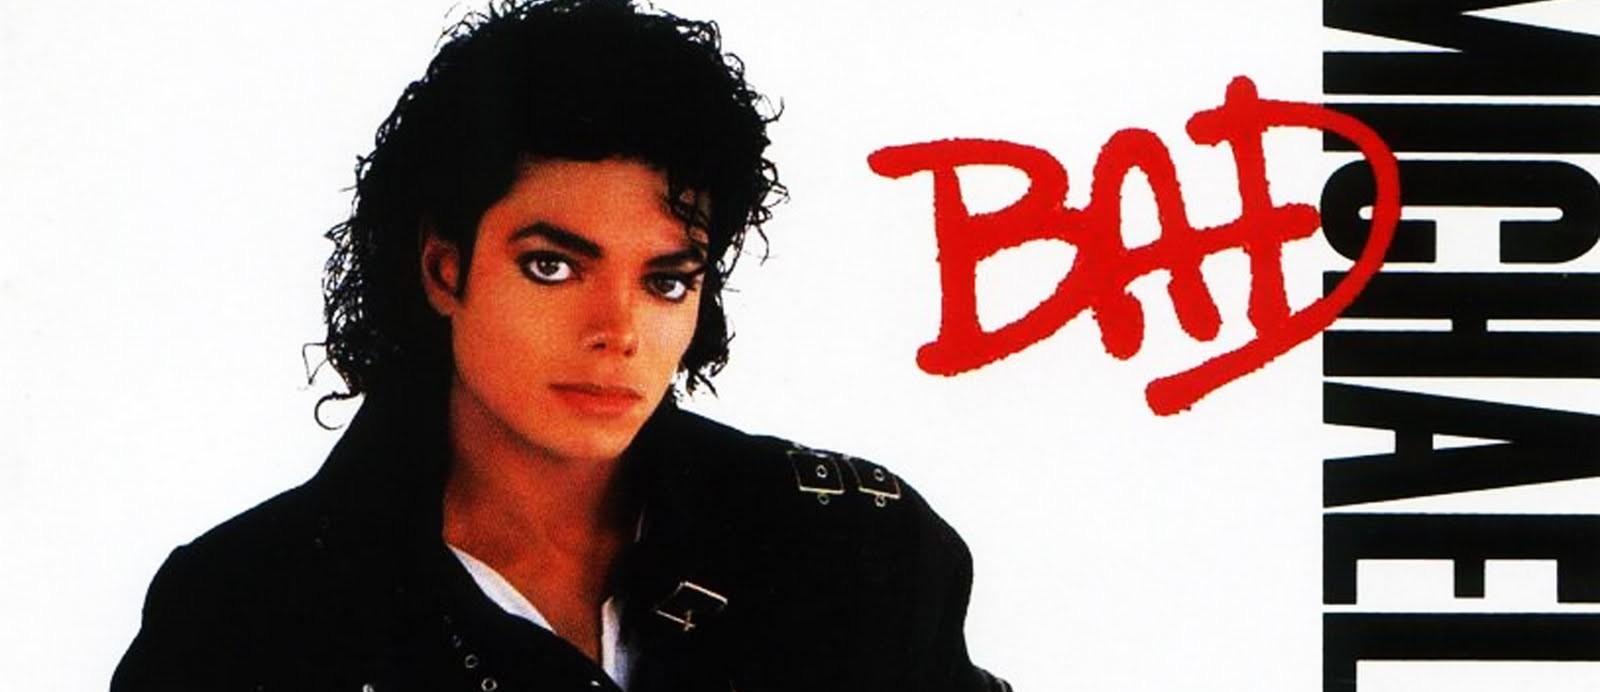 Michael-Jackson-Bad-2